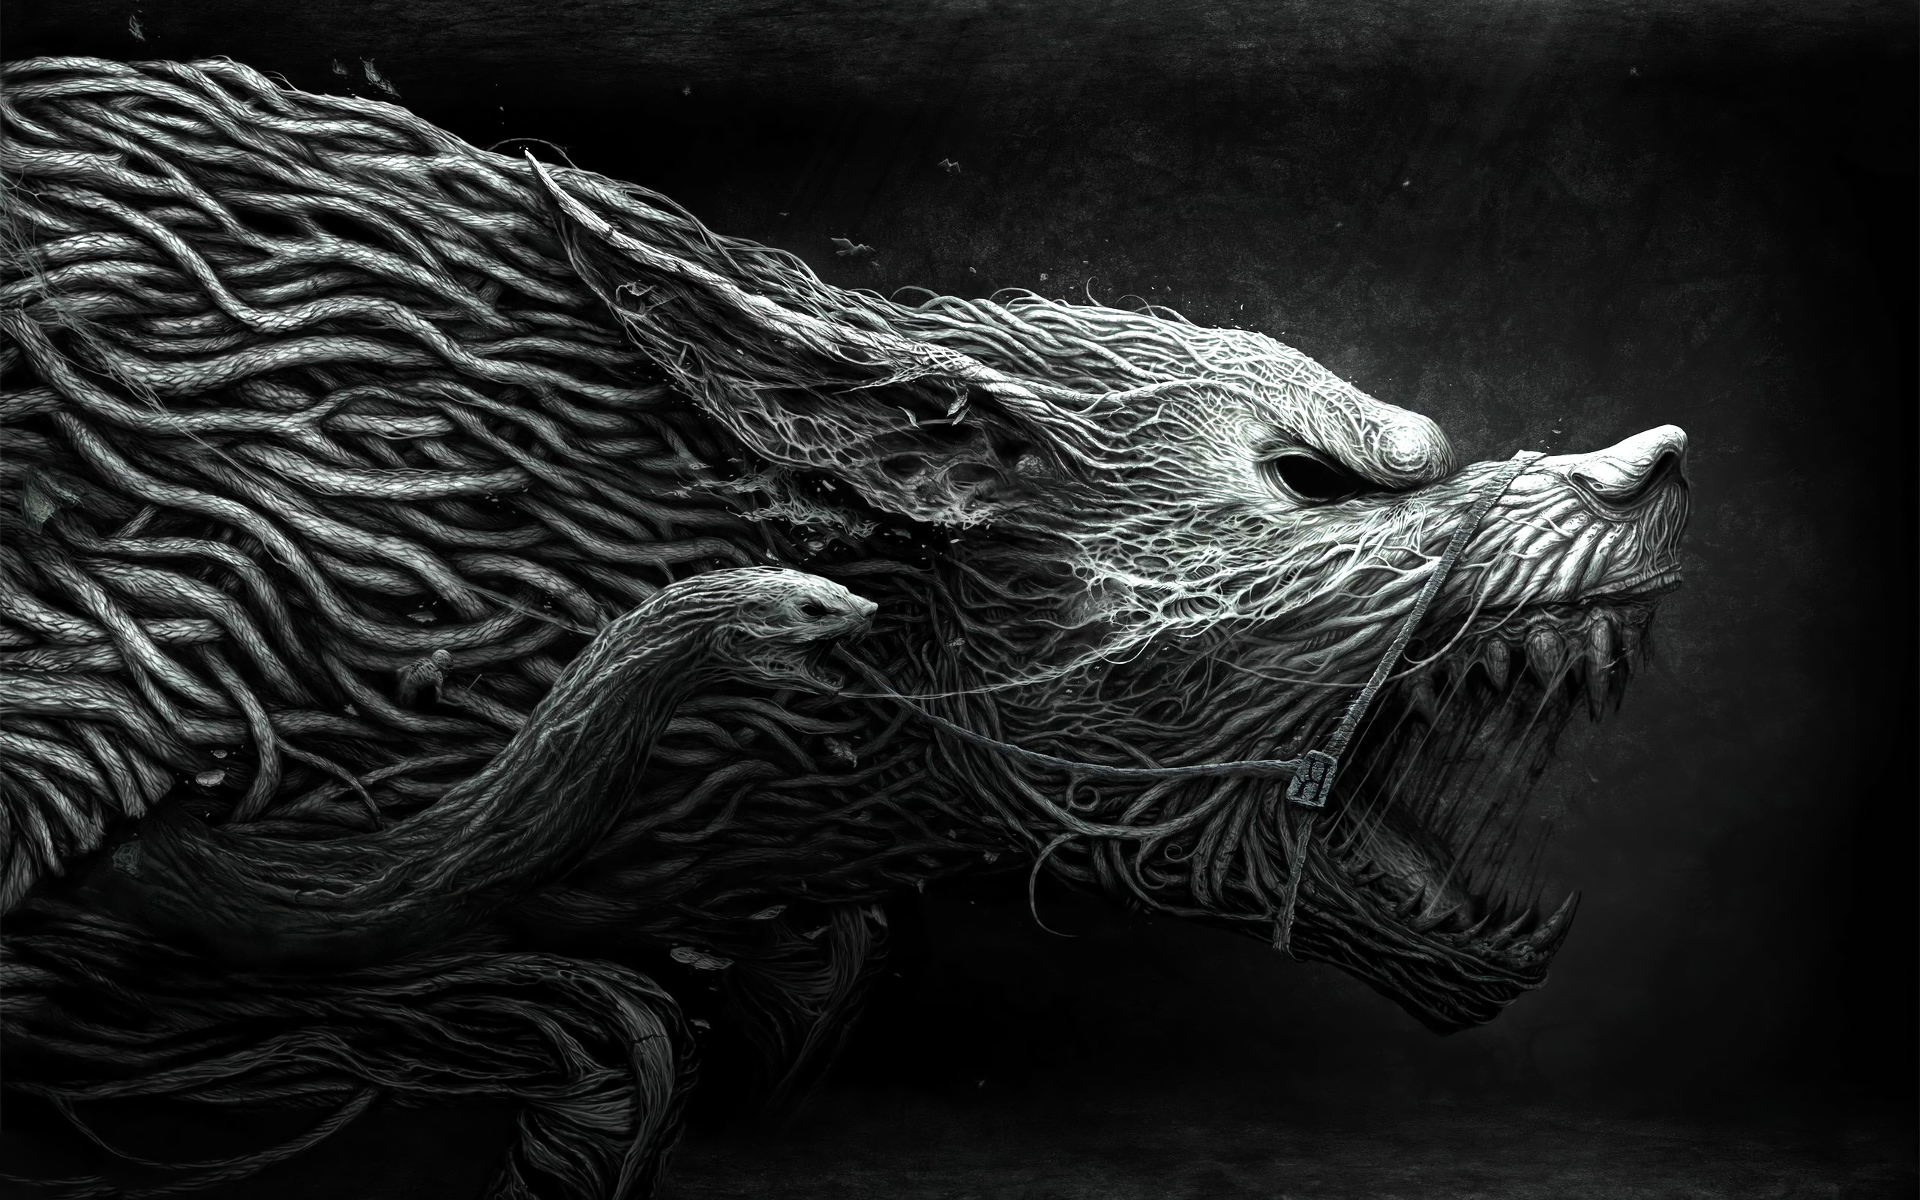 Dark - Werewolf  Dark Animal Fantasy Creature Snake Black Creepy Wallpaper